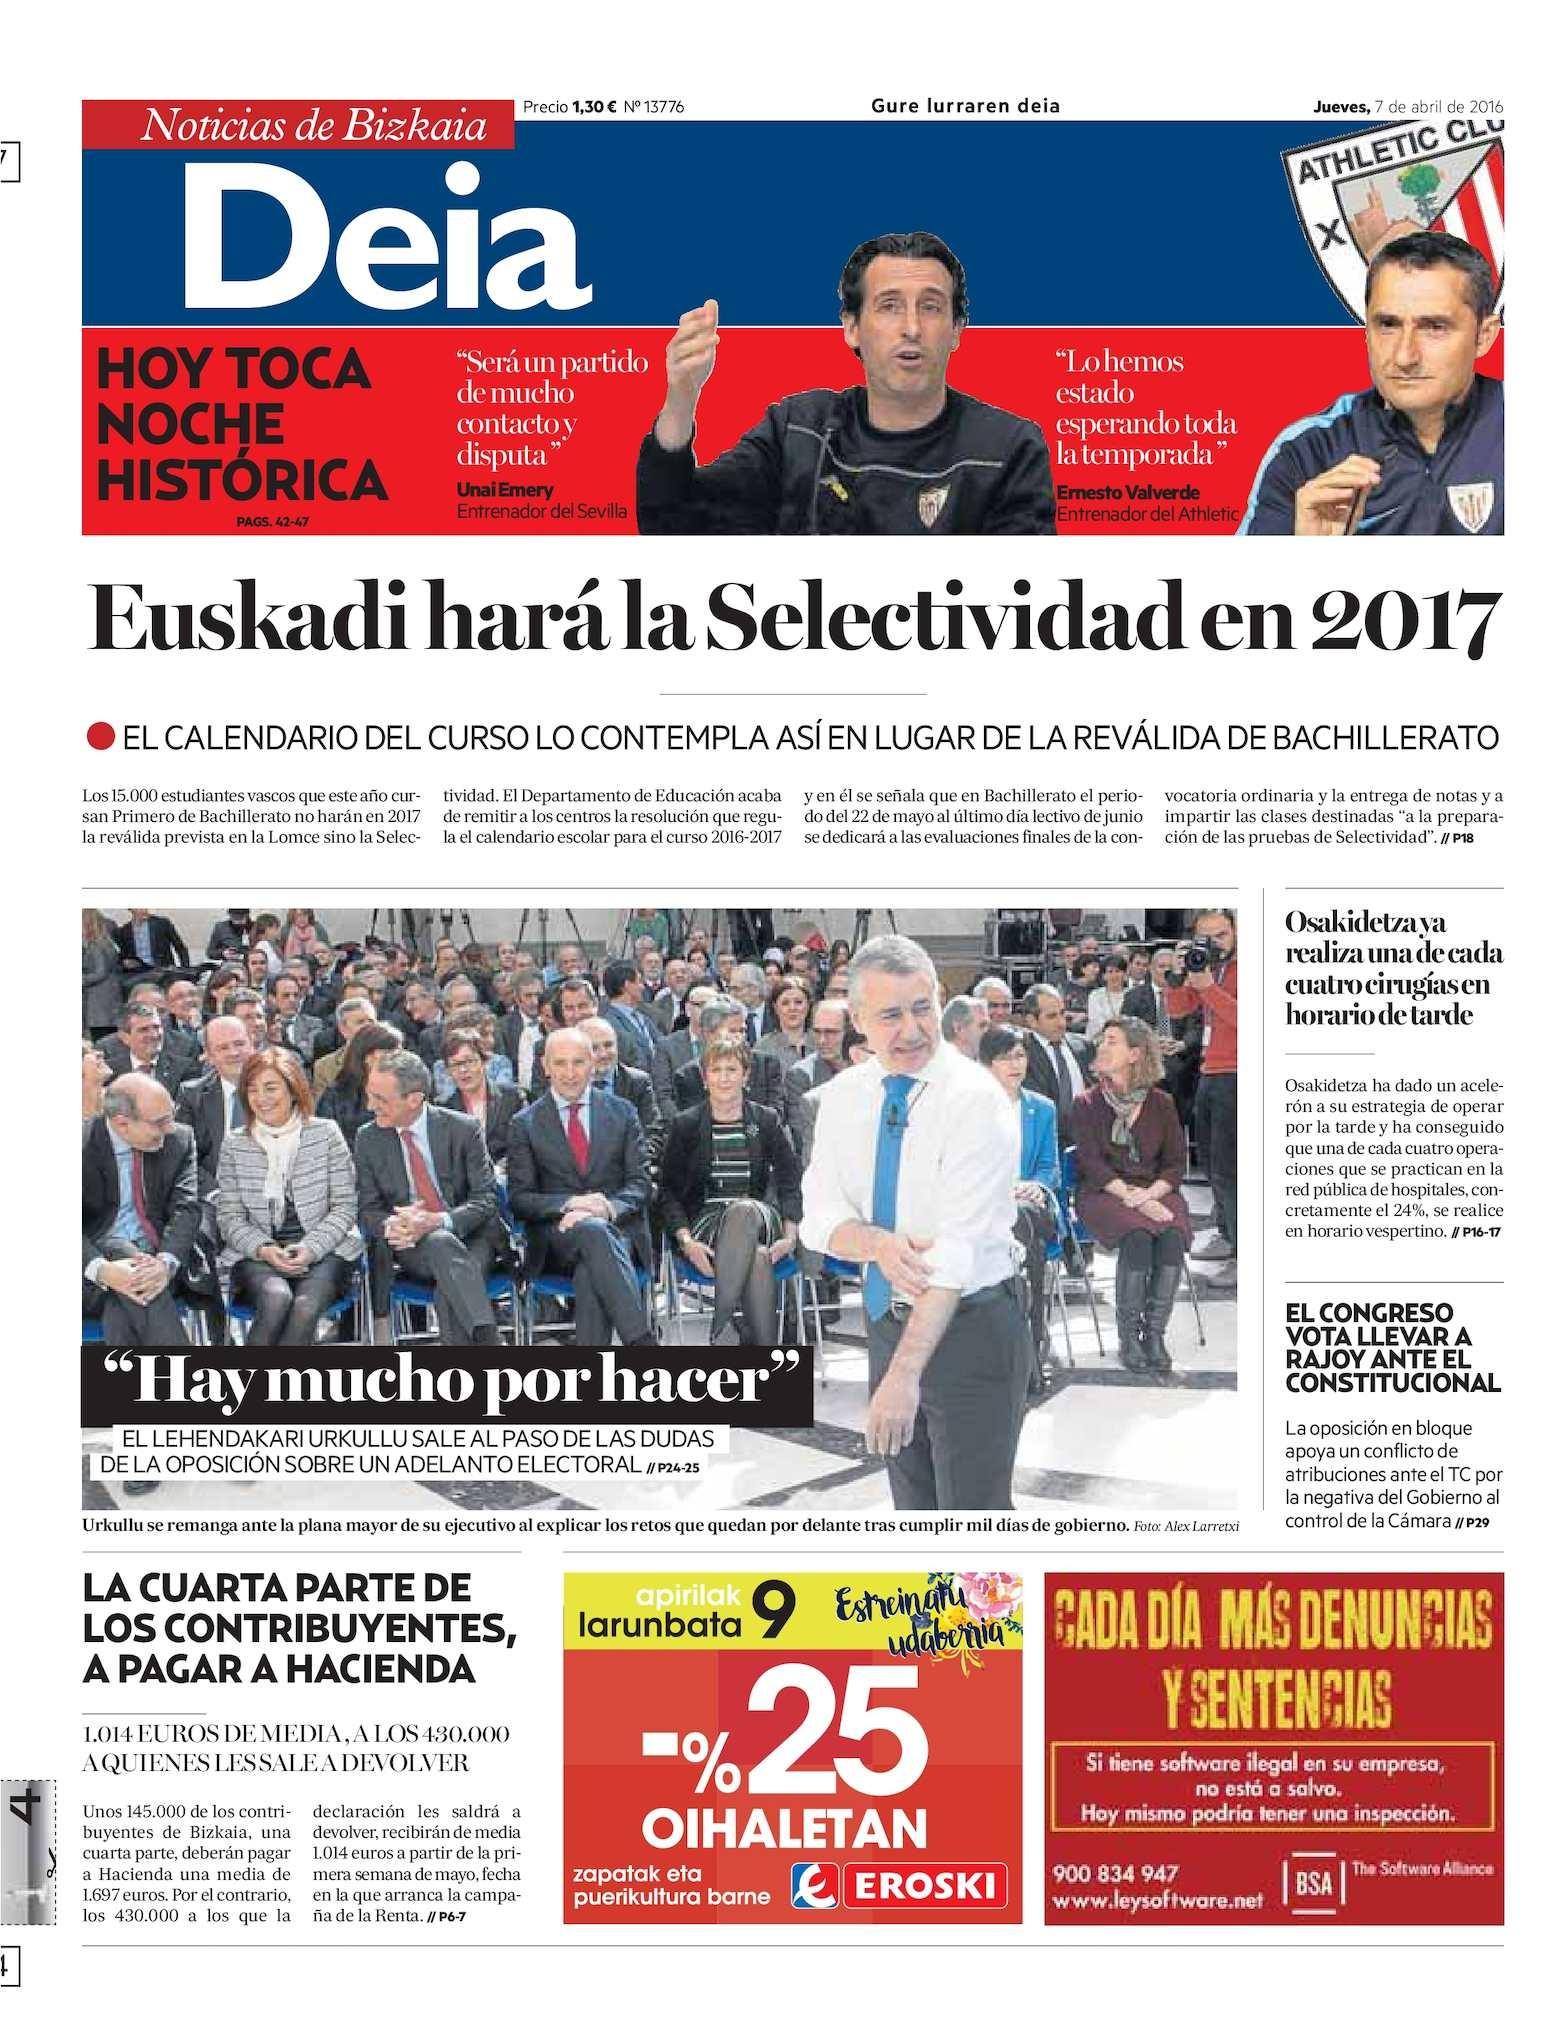 Calendario Escolar 2019 19 Valencia Imprimir Más Reciente Calaméo Deia